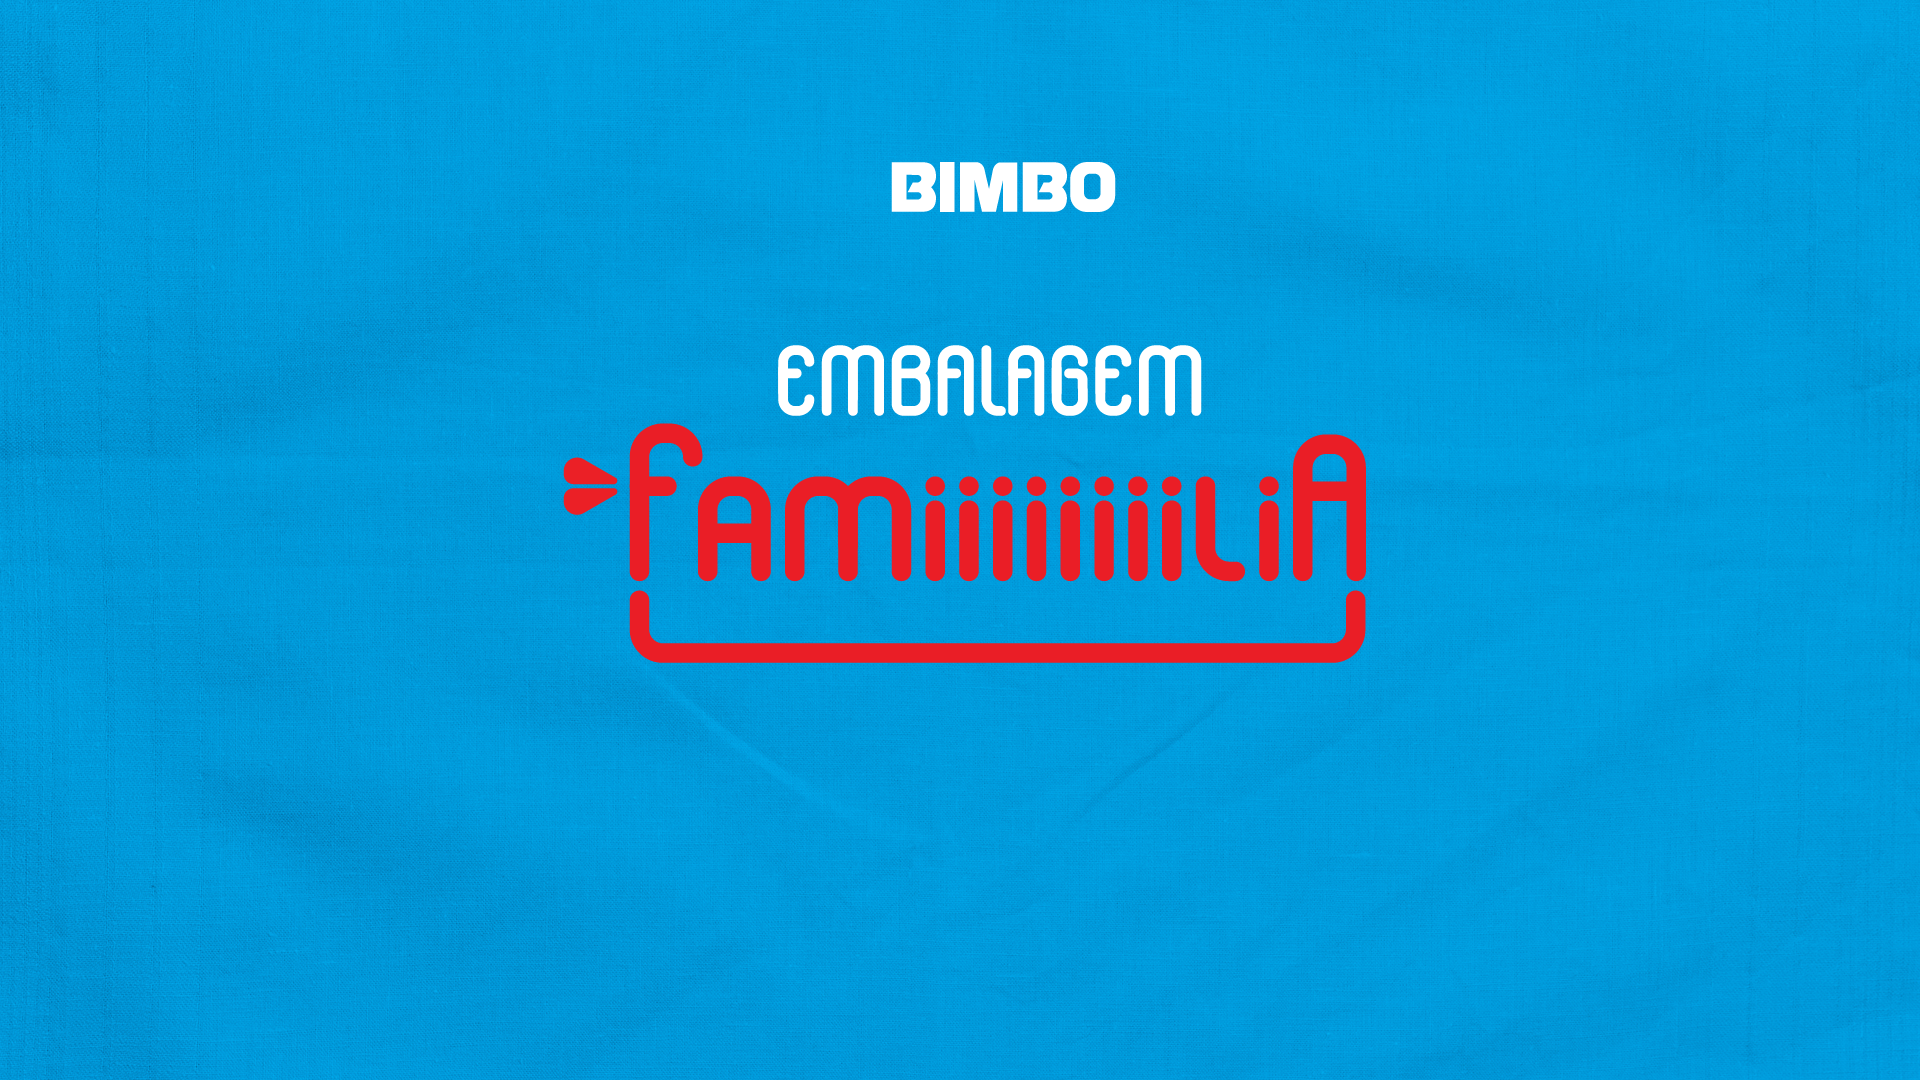 Case_bimbo_v4-104.png